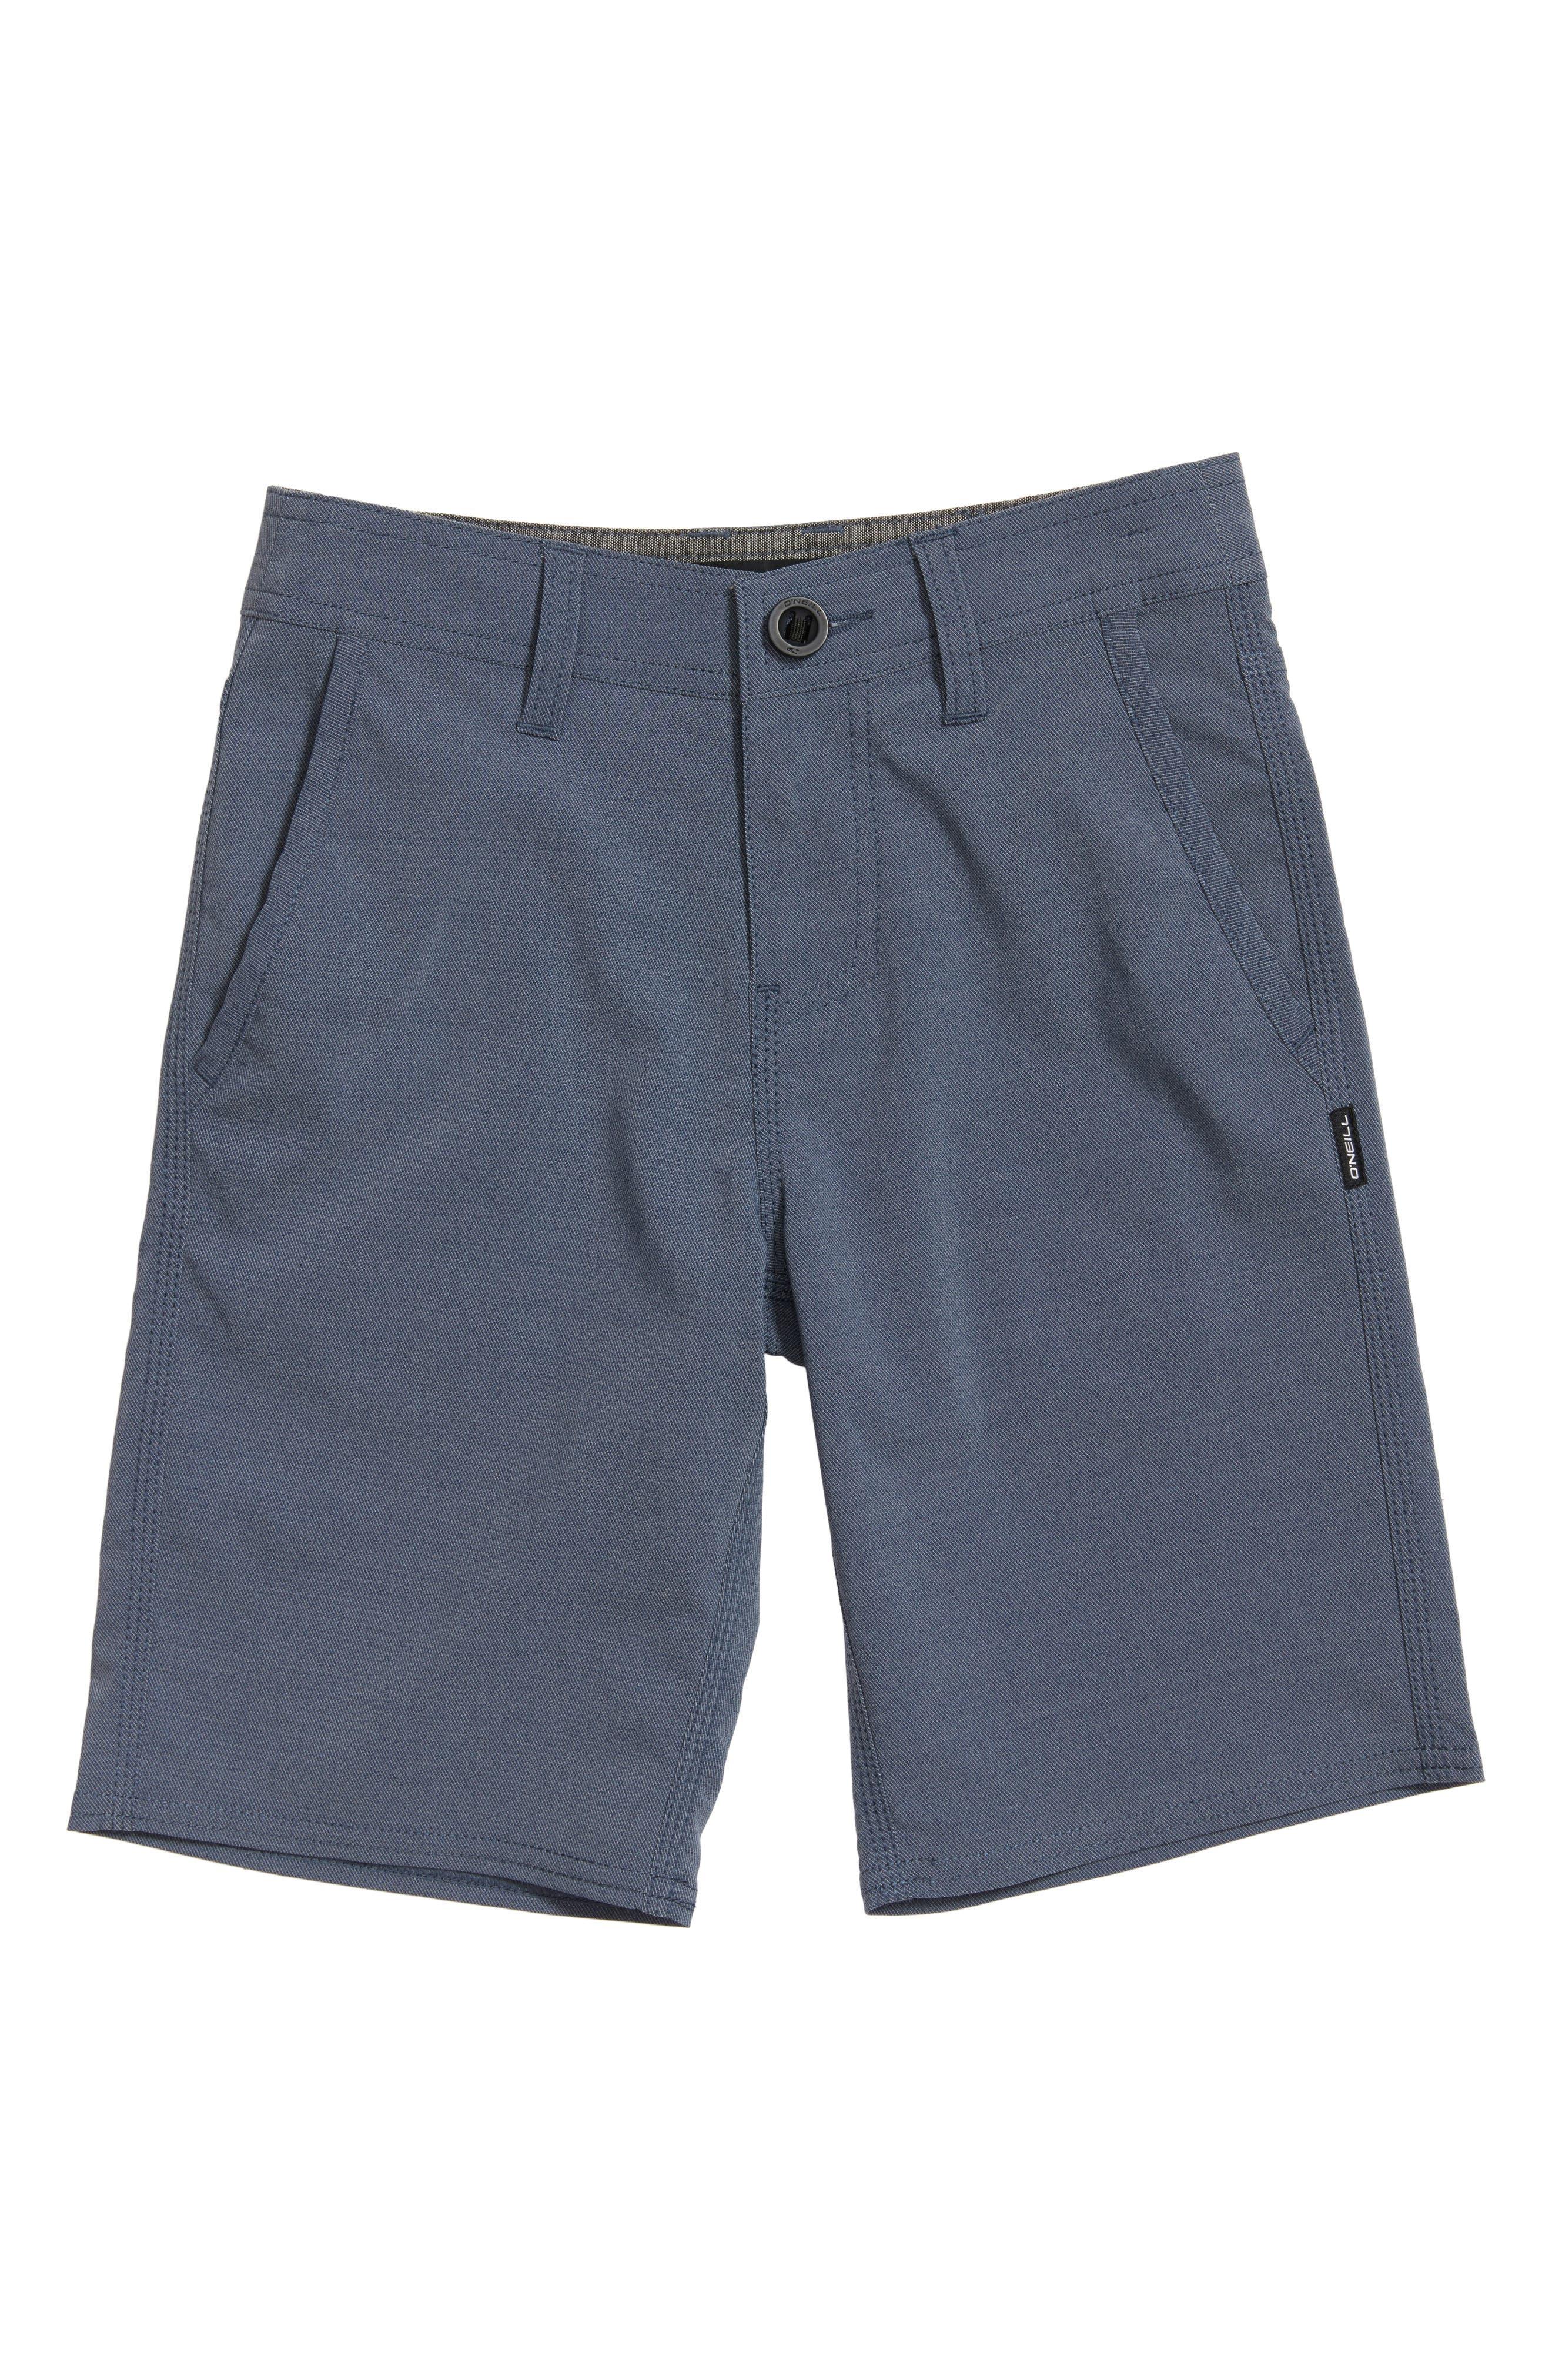 O'Neill Stockton Hybrid Shorts (Big Boys)